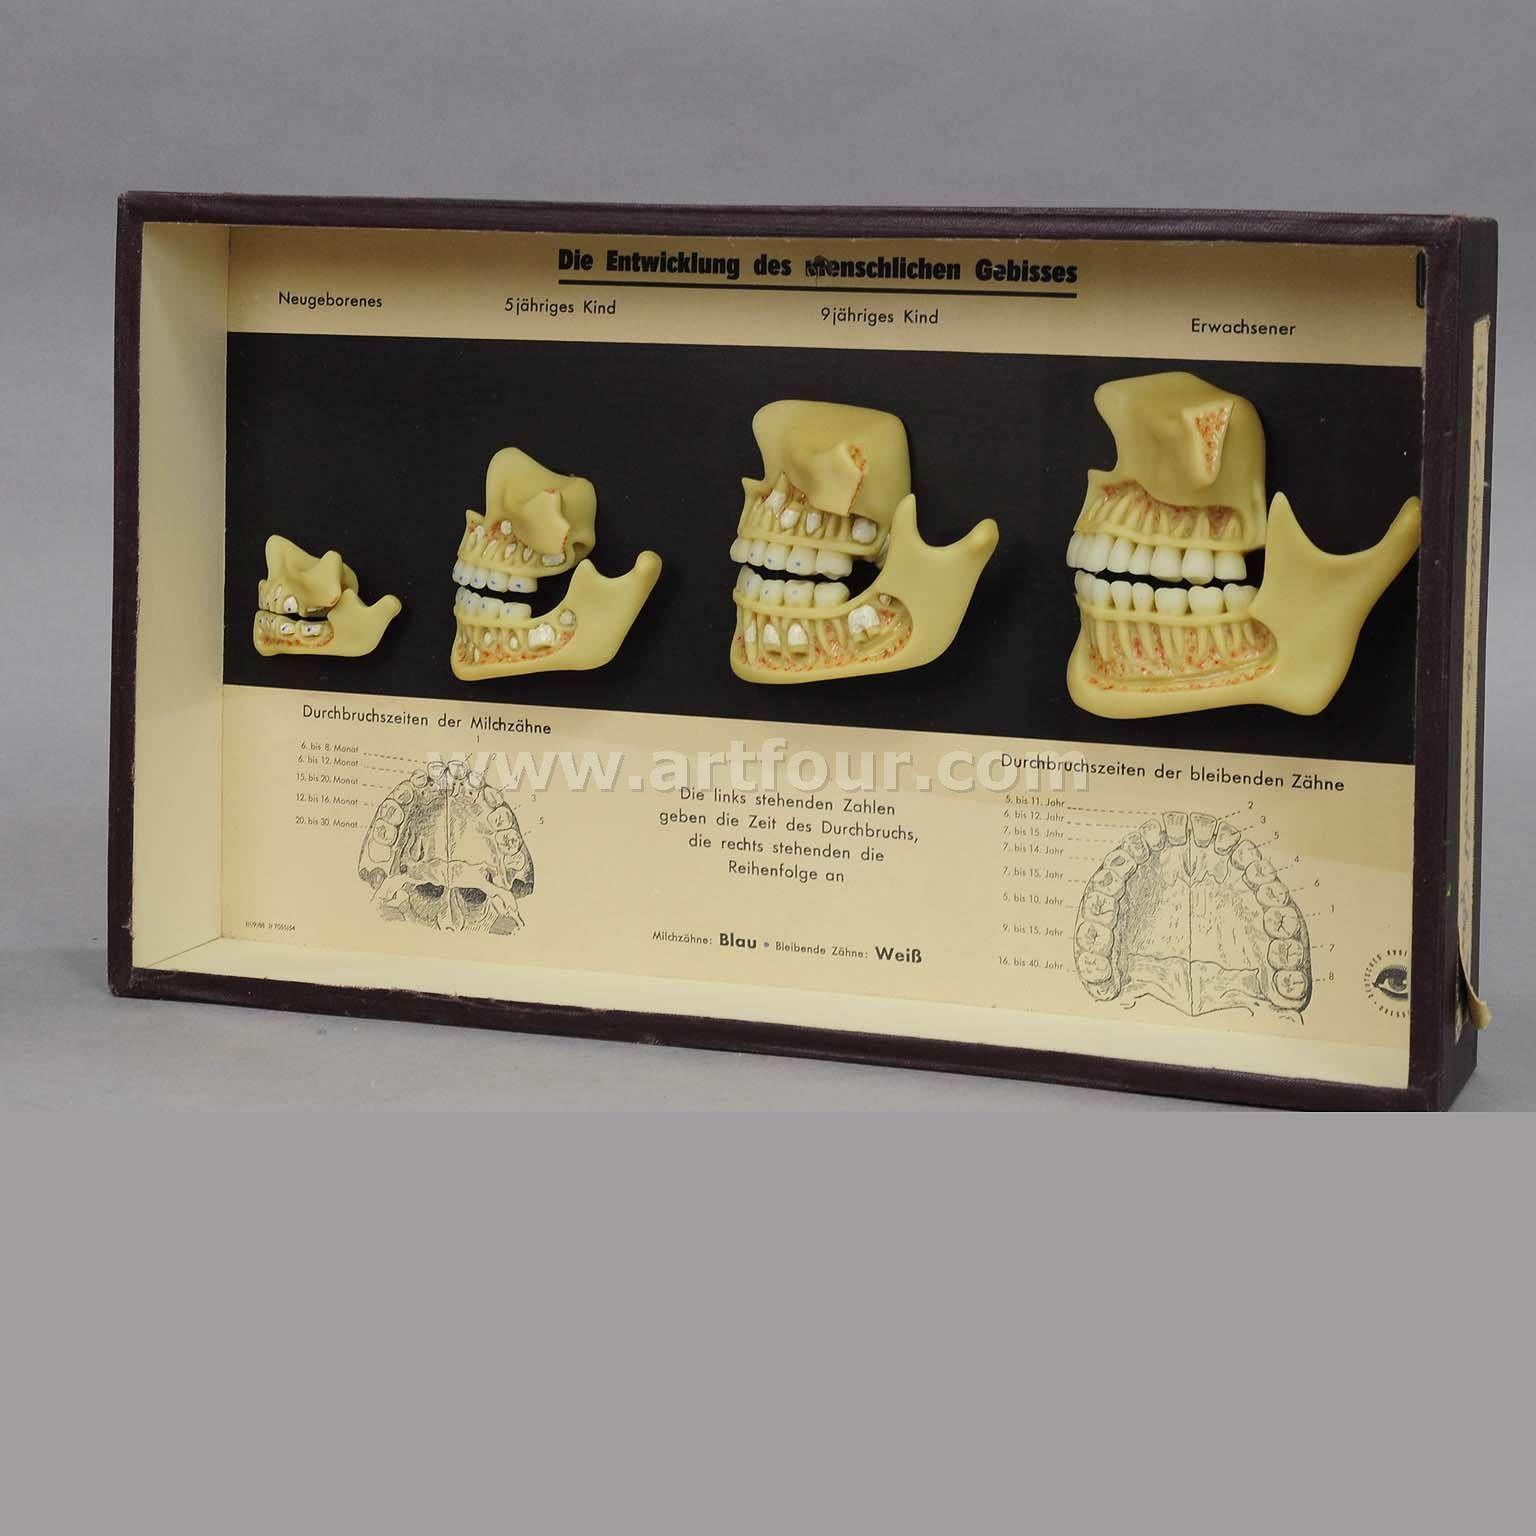 Decorative Arts Wax Specimen Showcase Human Bite Development High Quality Materials